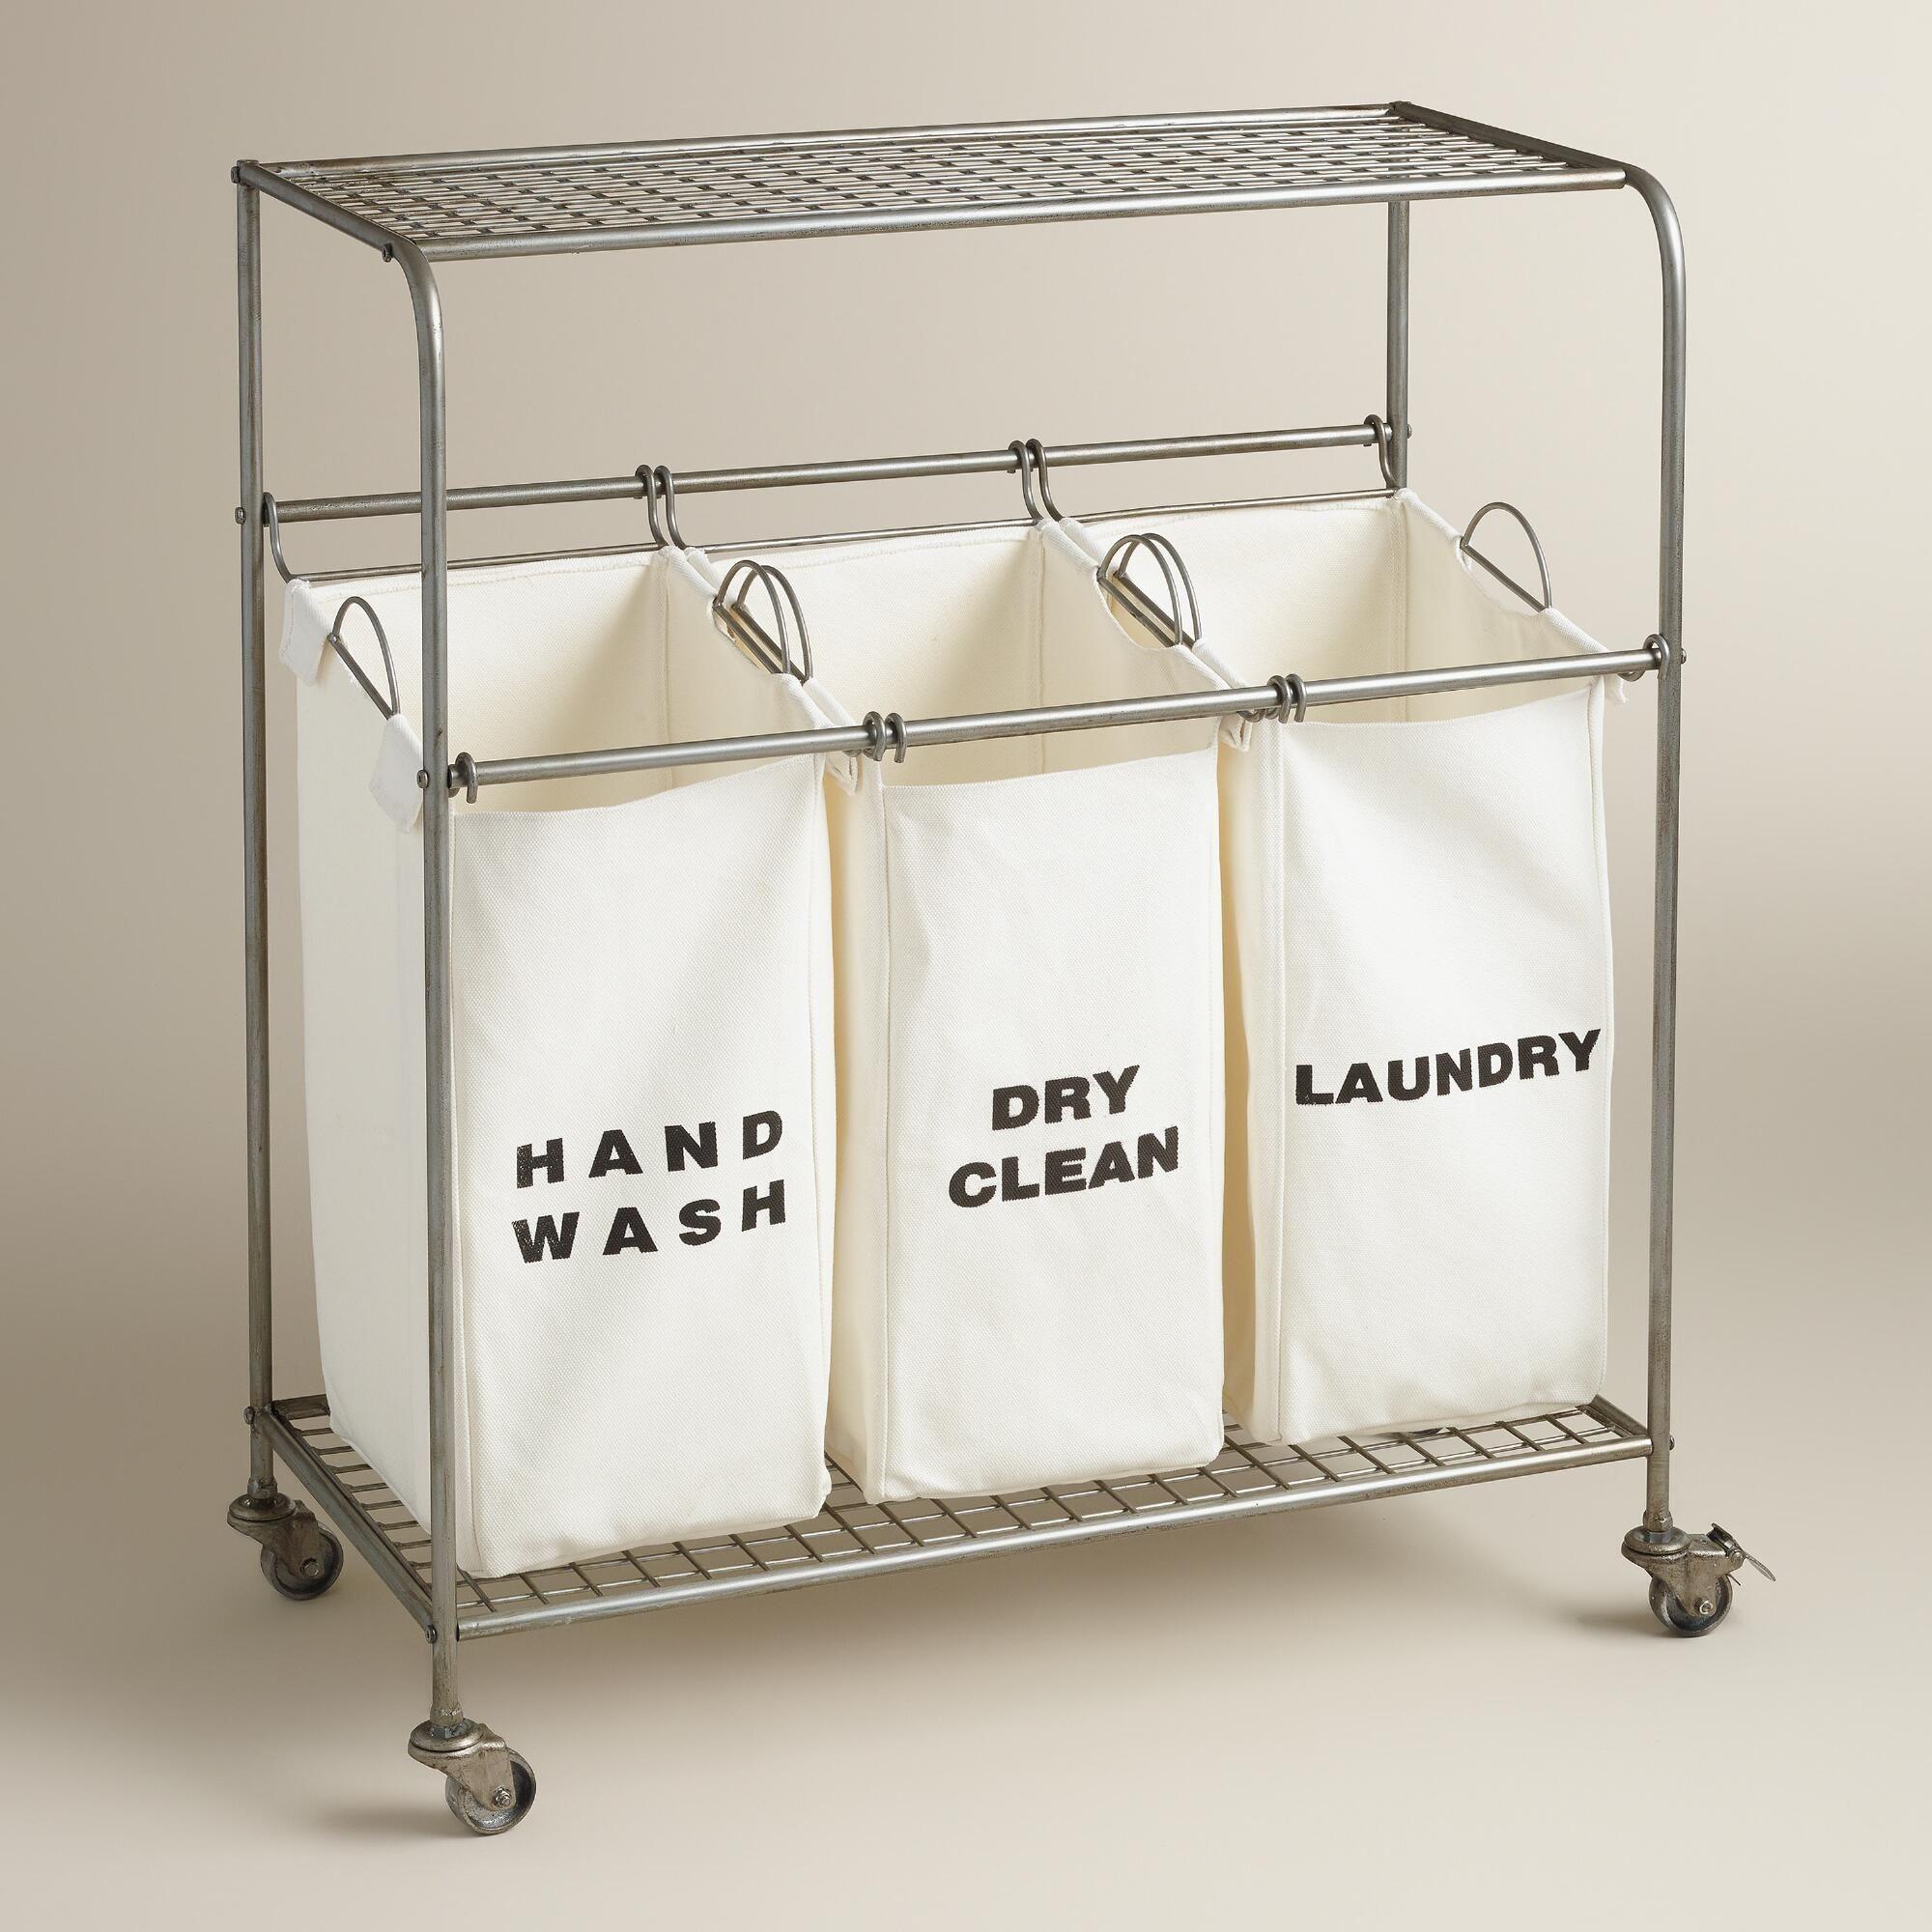 Metal 3 Bag Ashton Laundry Cart Laundry Cart Laundry Shop Laundry Room Inspiration